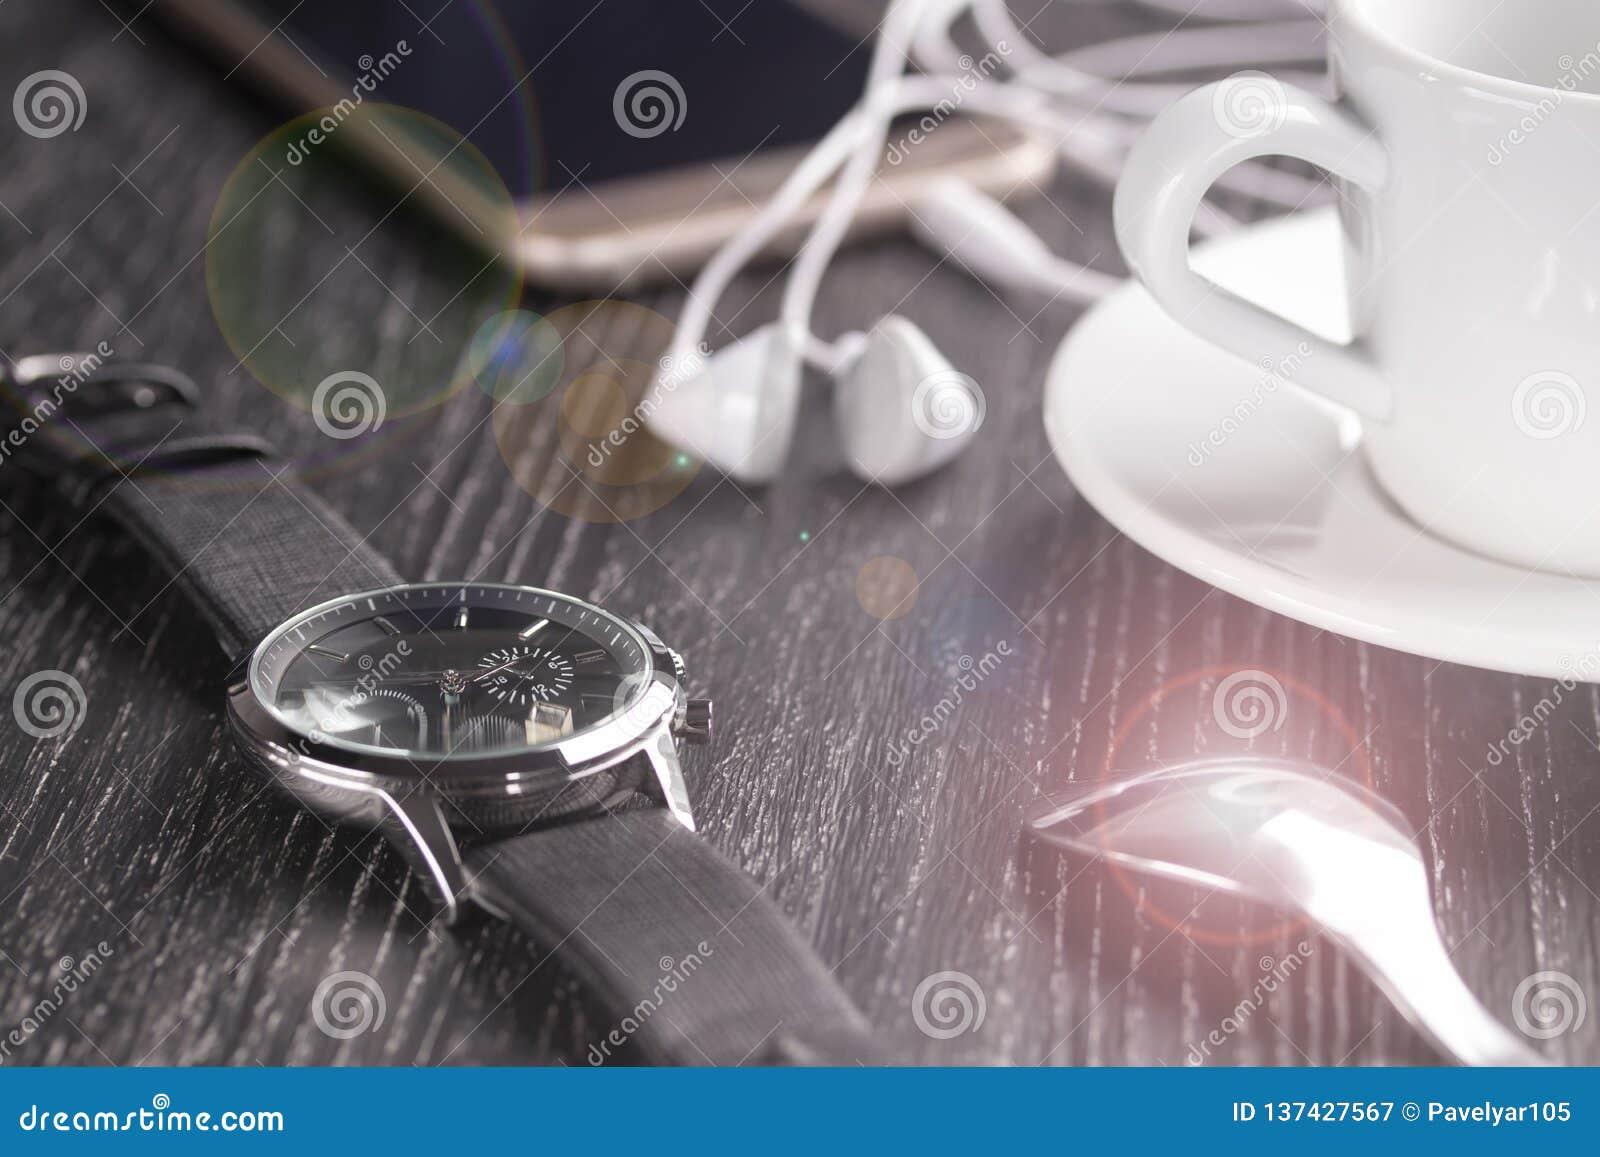 Wristwatch και κινητό τηλέφωνο με τα ακουστικά και ένα φλιτζάνι του καφέ σε έναν σκοτεινό ξύλινο πίνακα